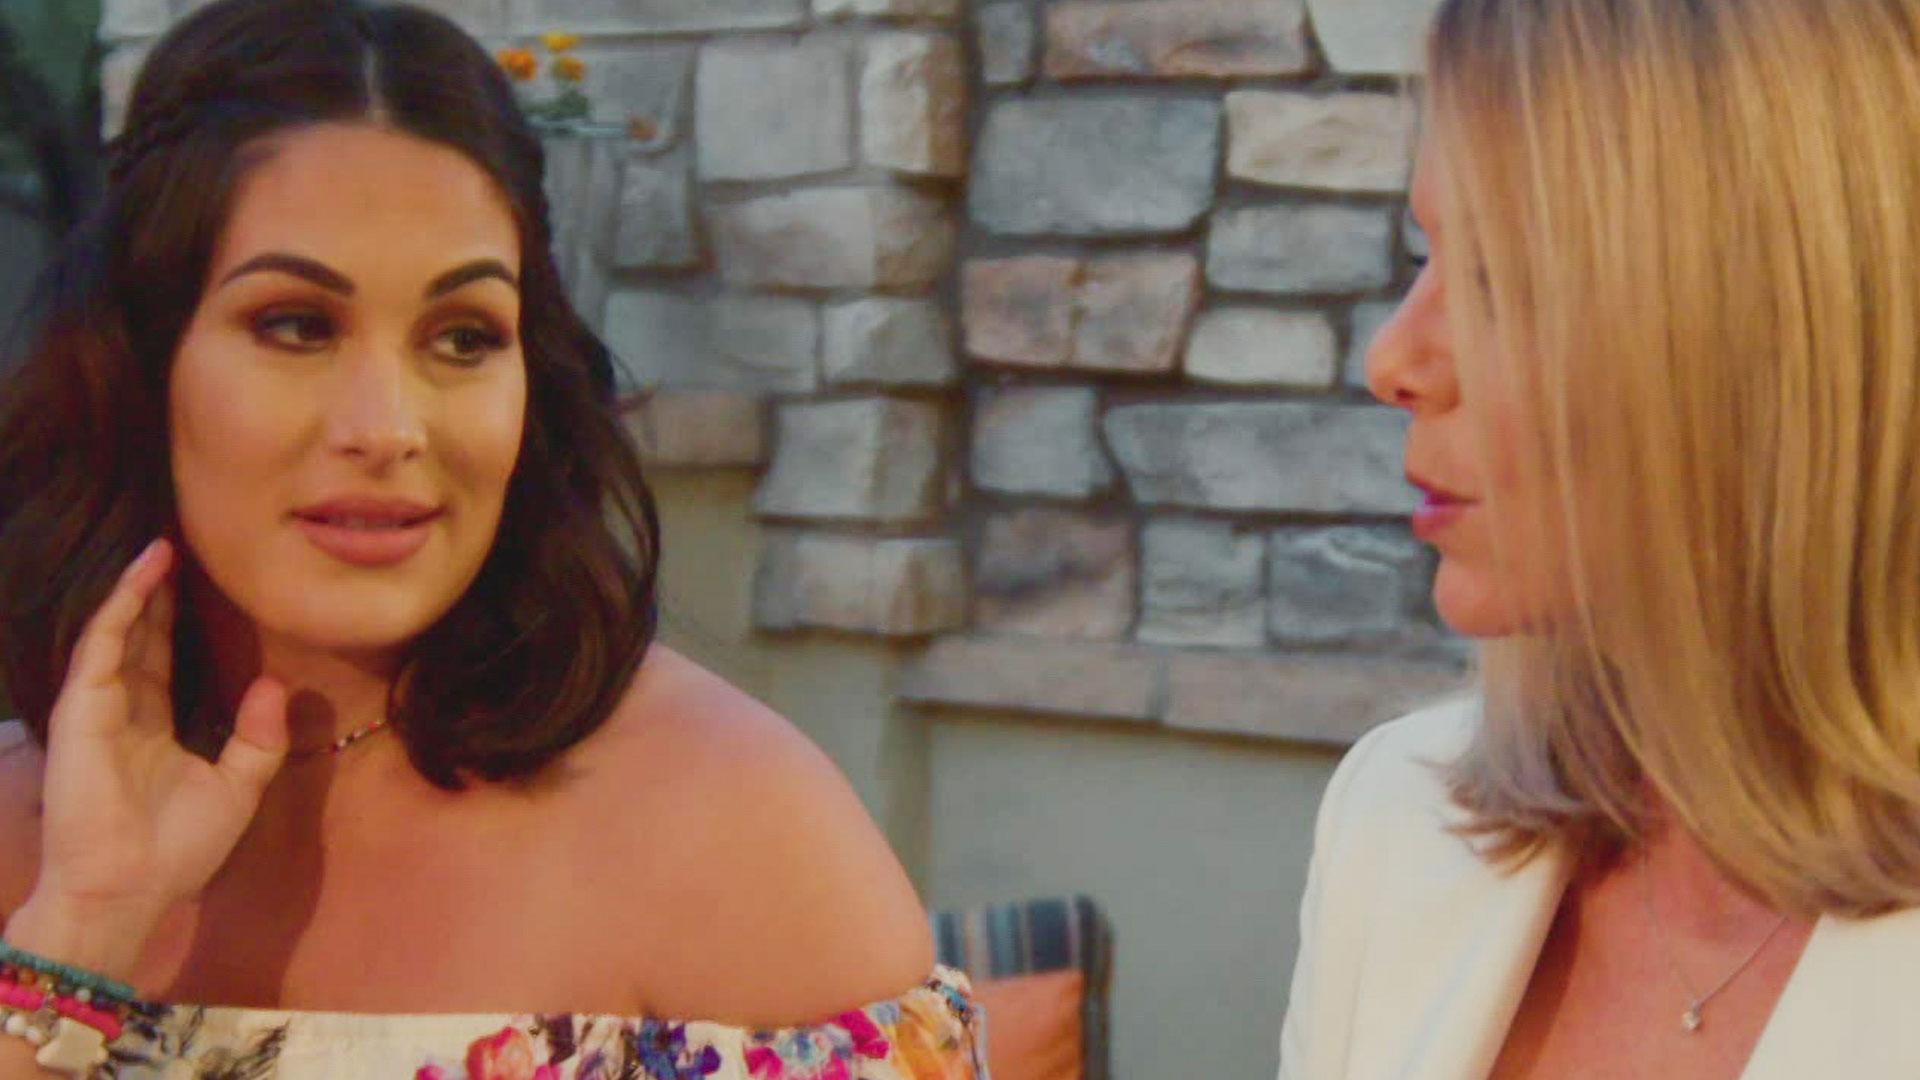 Total Bellas - Season 2, Episode 6 highlights